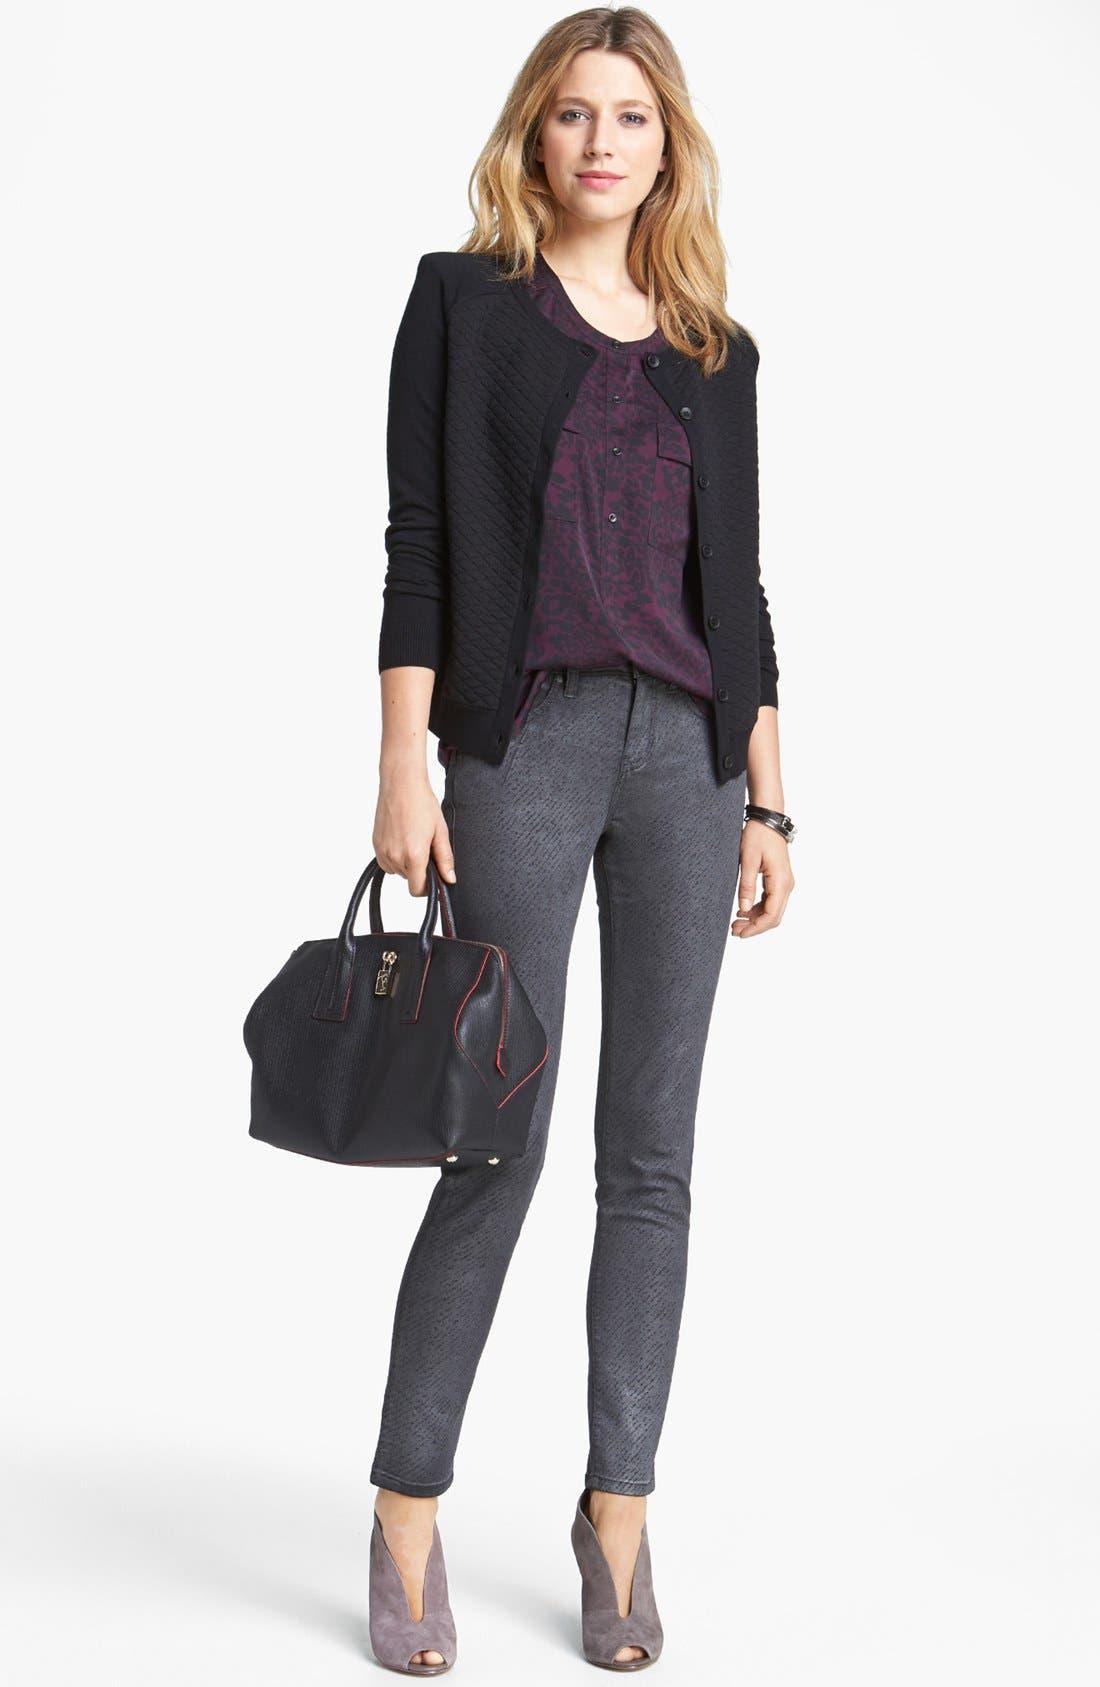 Main Image - Halogen® Cardigan, Trouvé Blouse & Jag Jeans Skinny Jeans